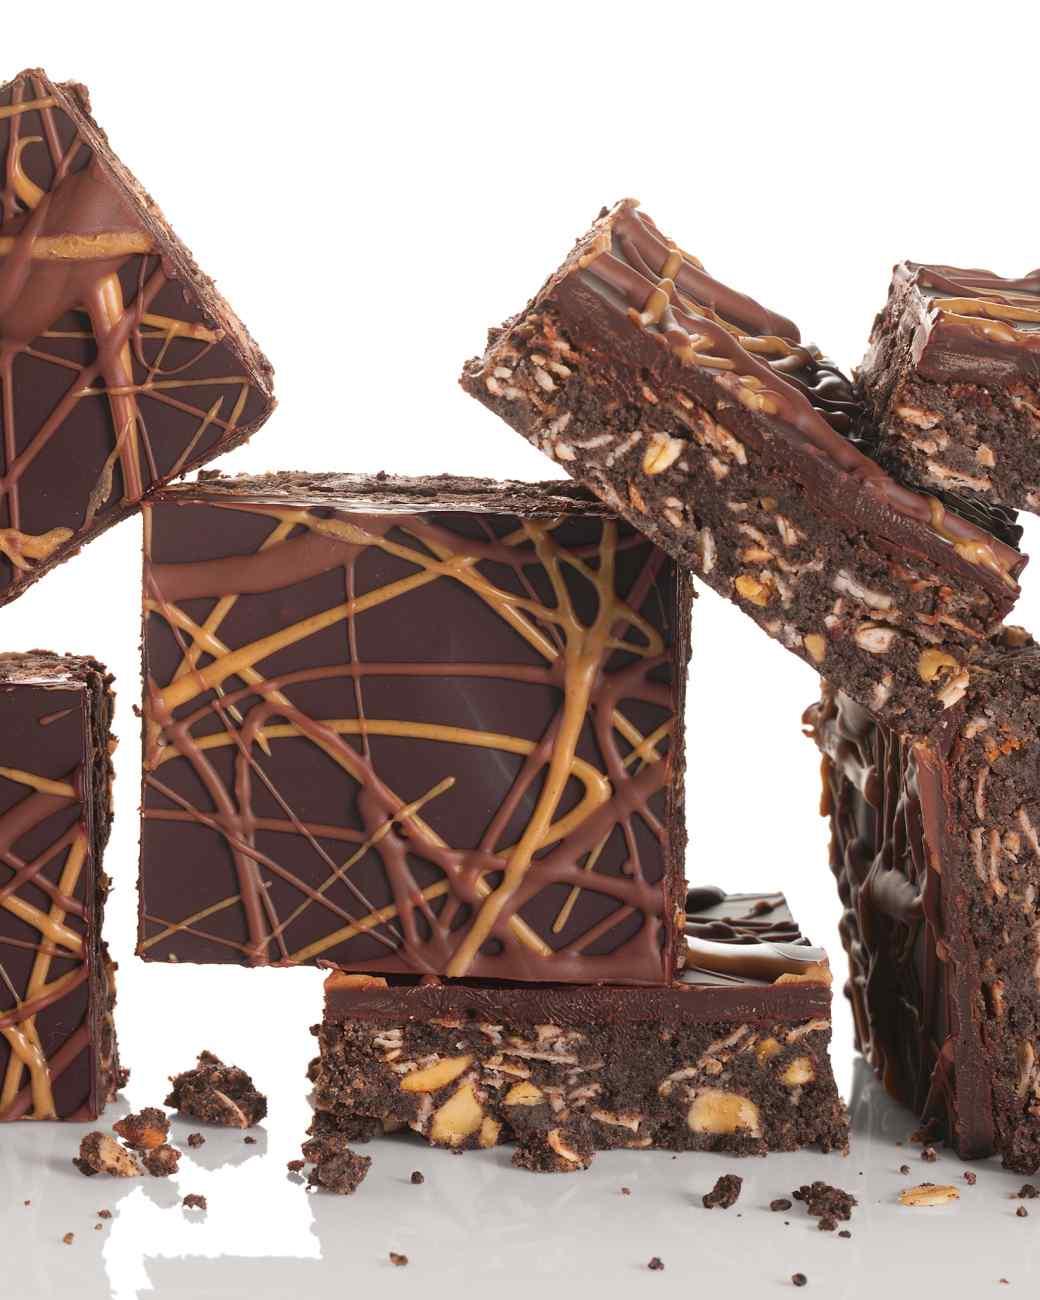 peanutbutterchocolatenobake